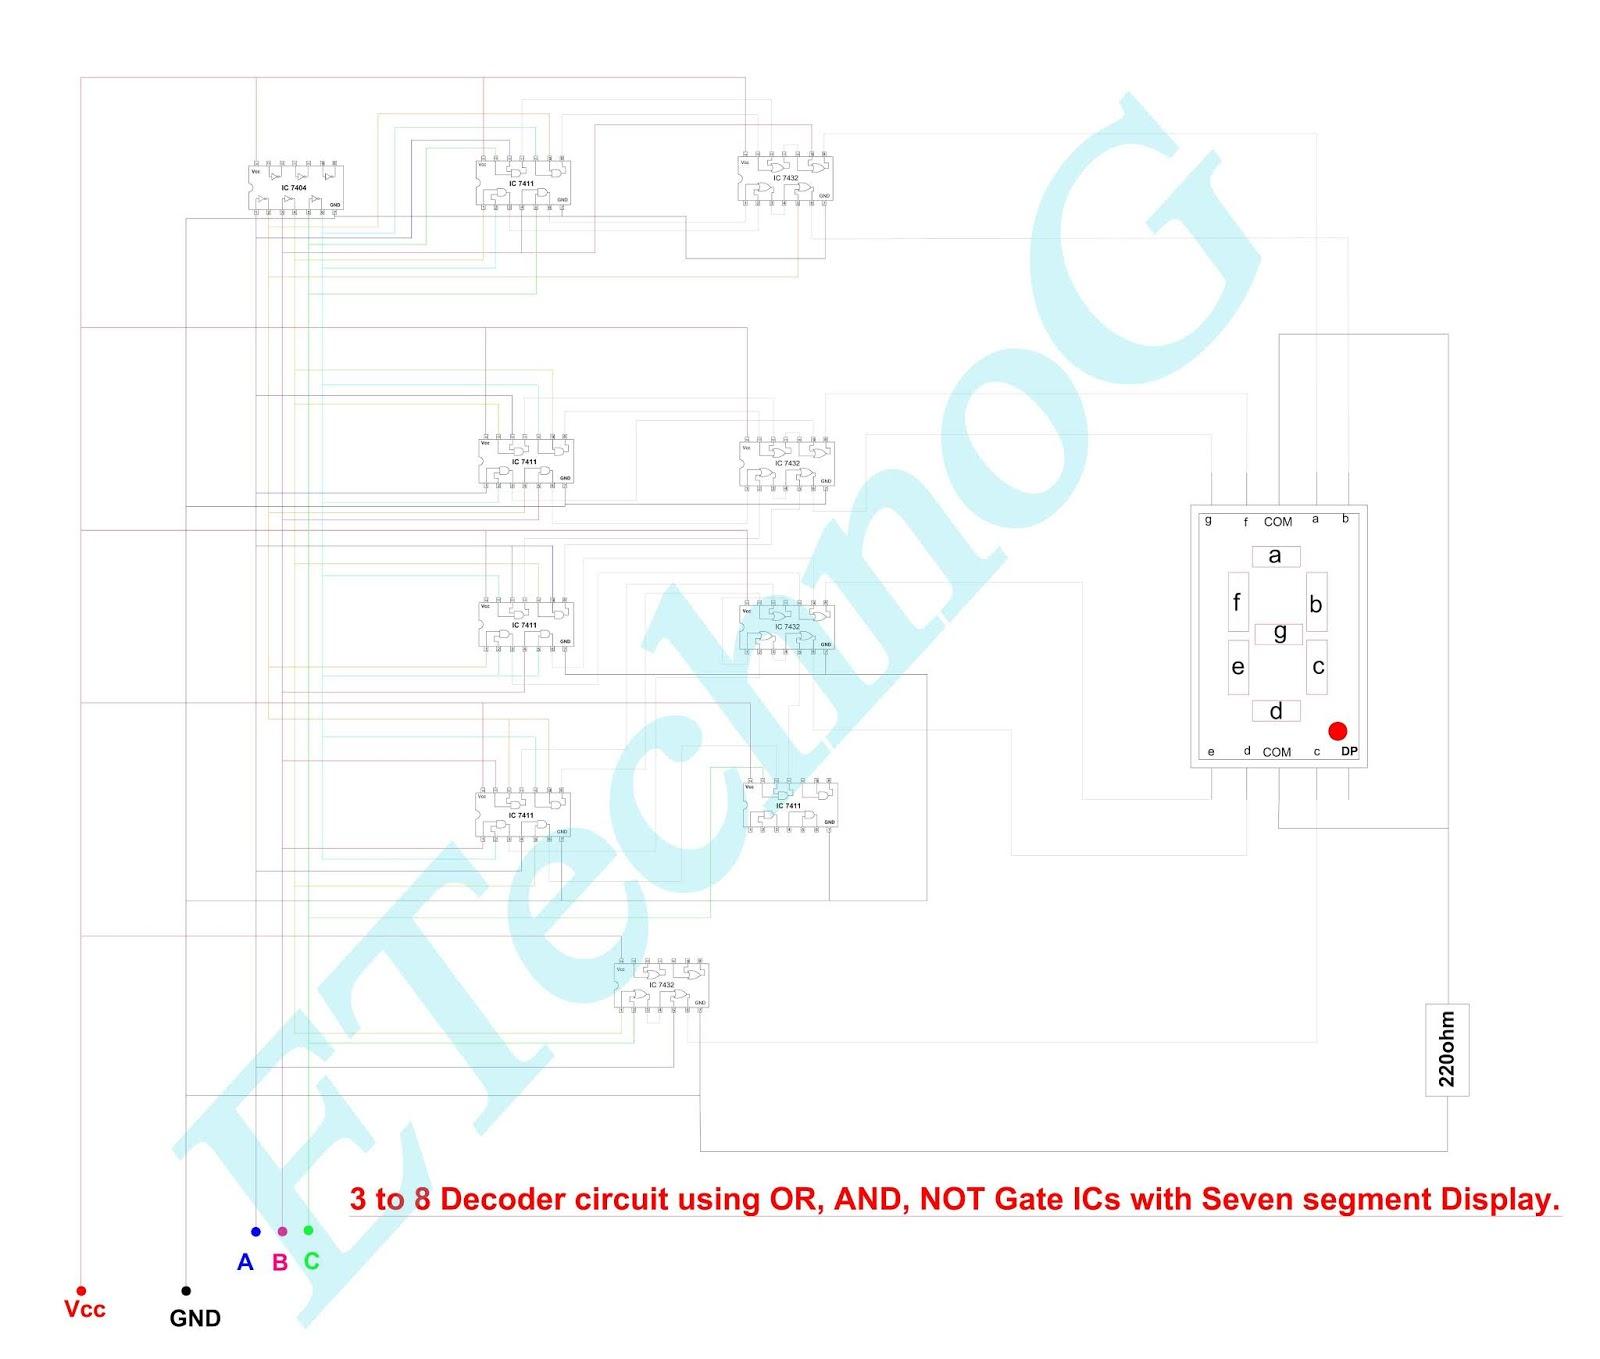 3 to 8 decoder circuit diagram 3 to 8 decoder truth table circuit design [ 1600 x 1359 Pixel ]